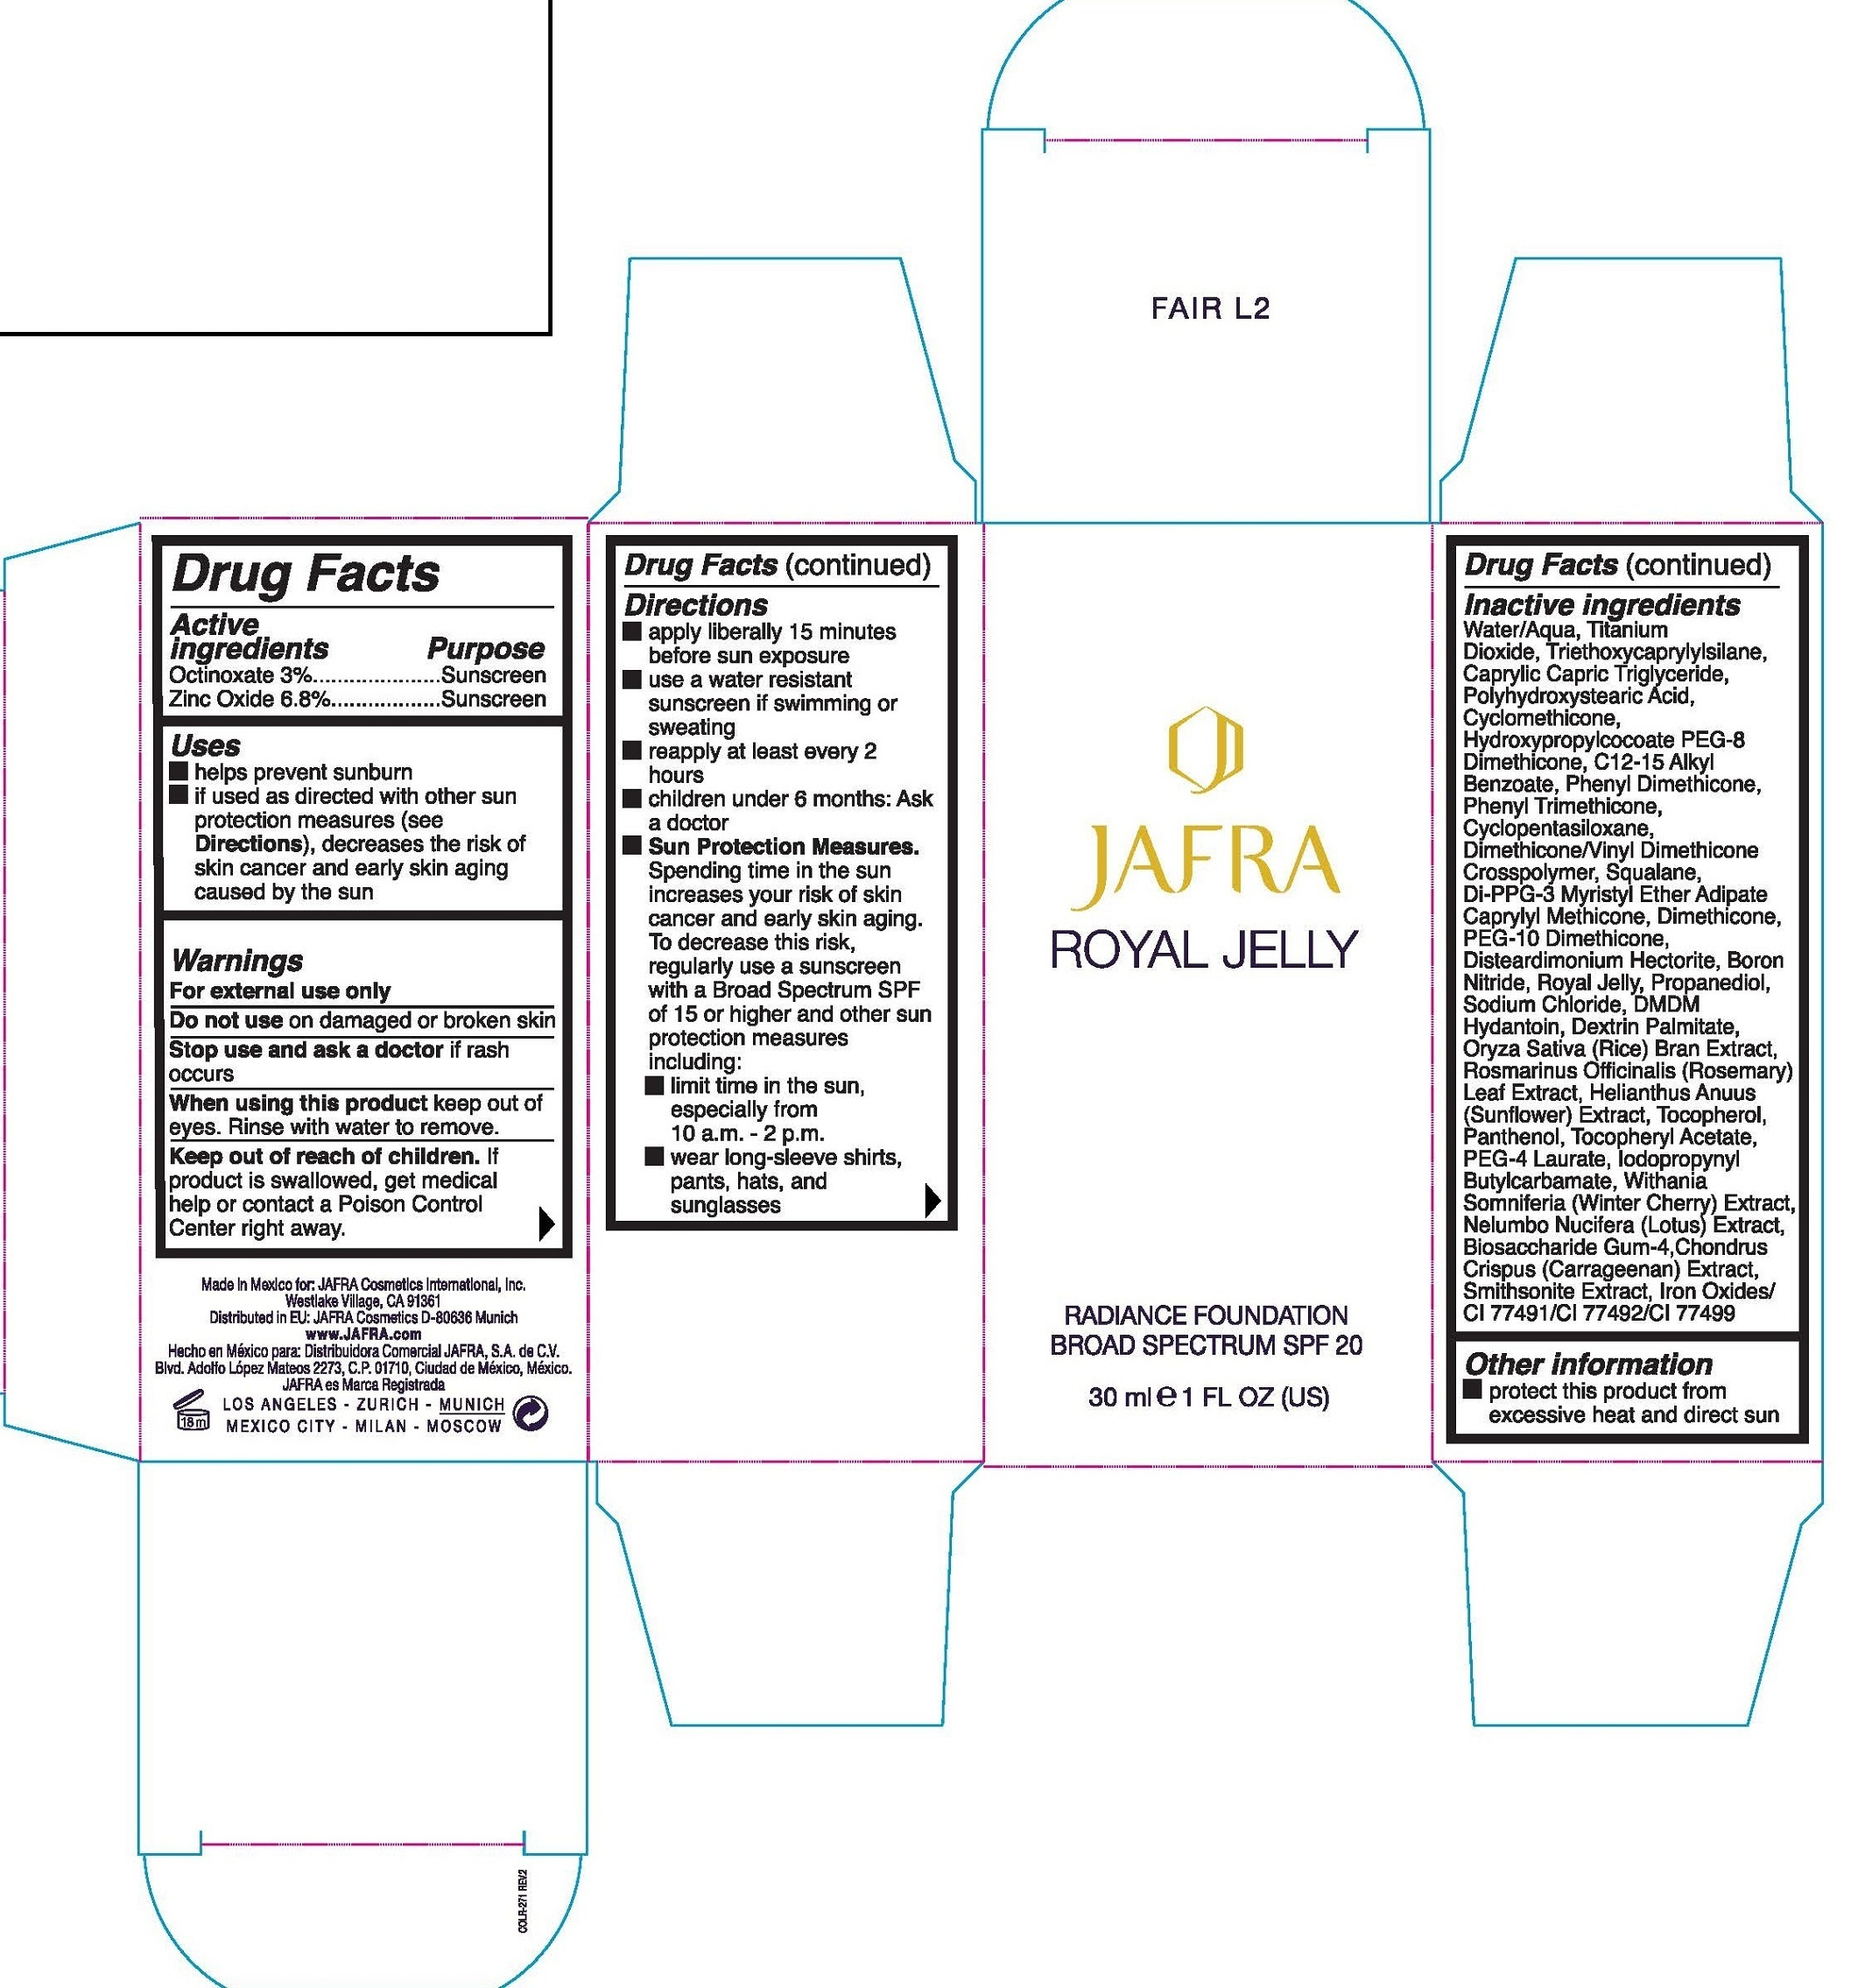 Royal Jelly Label